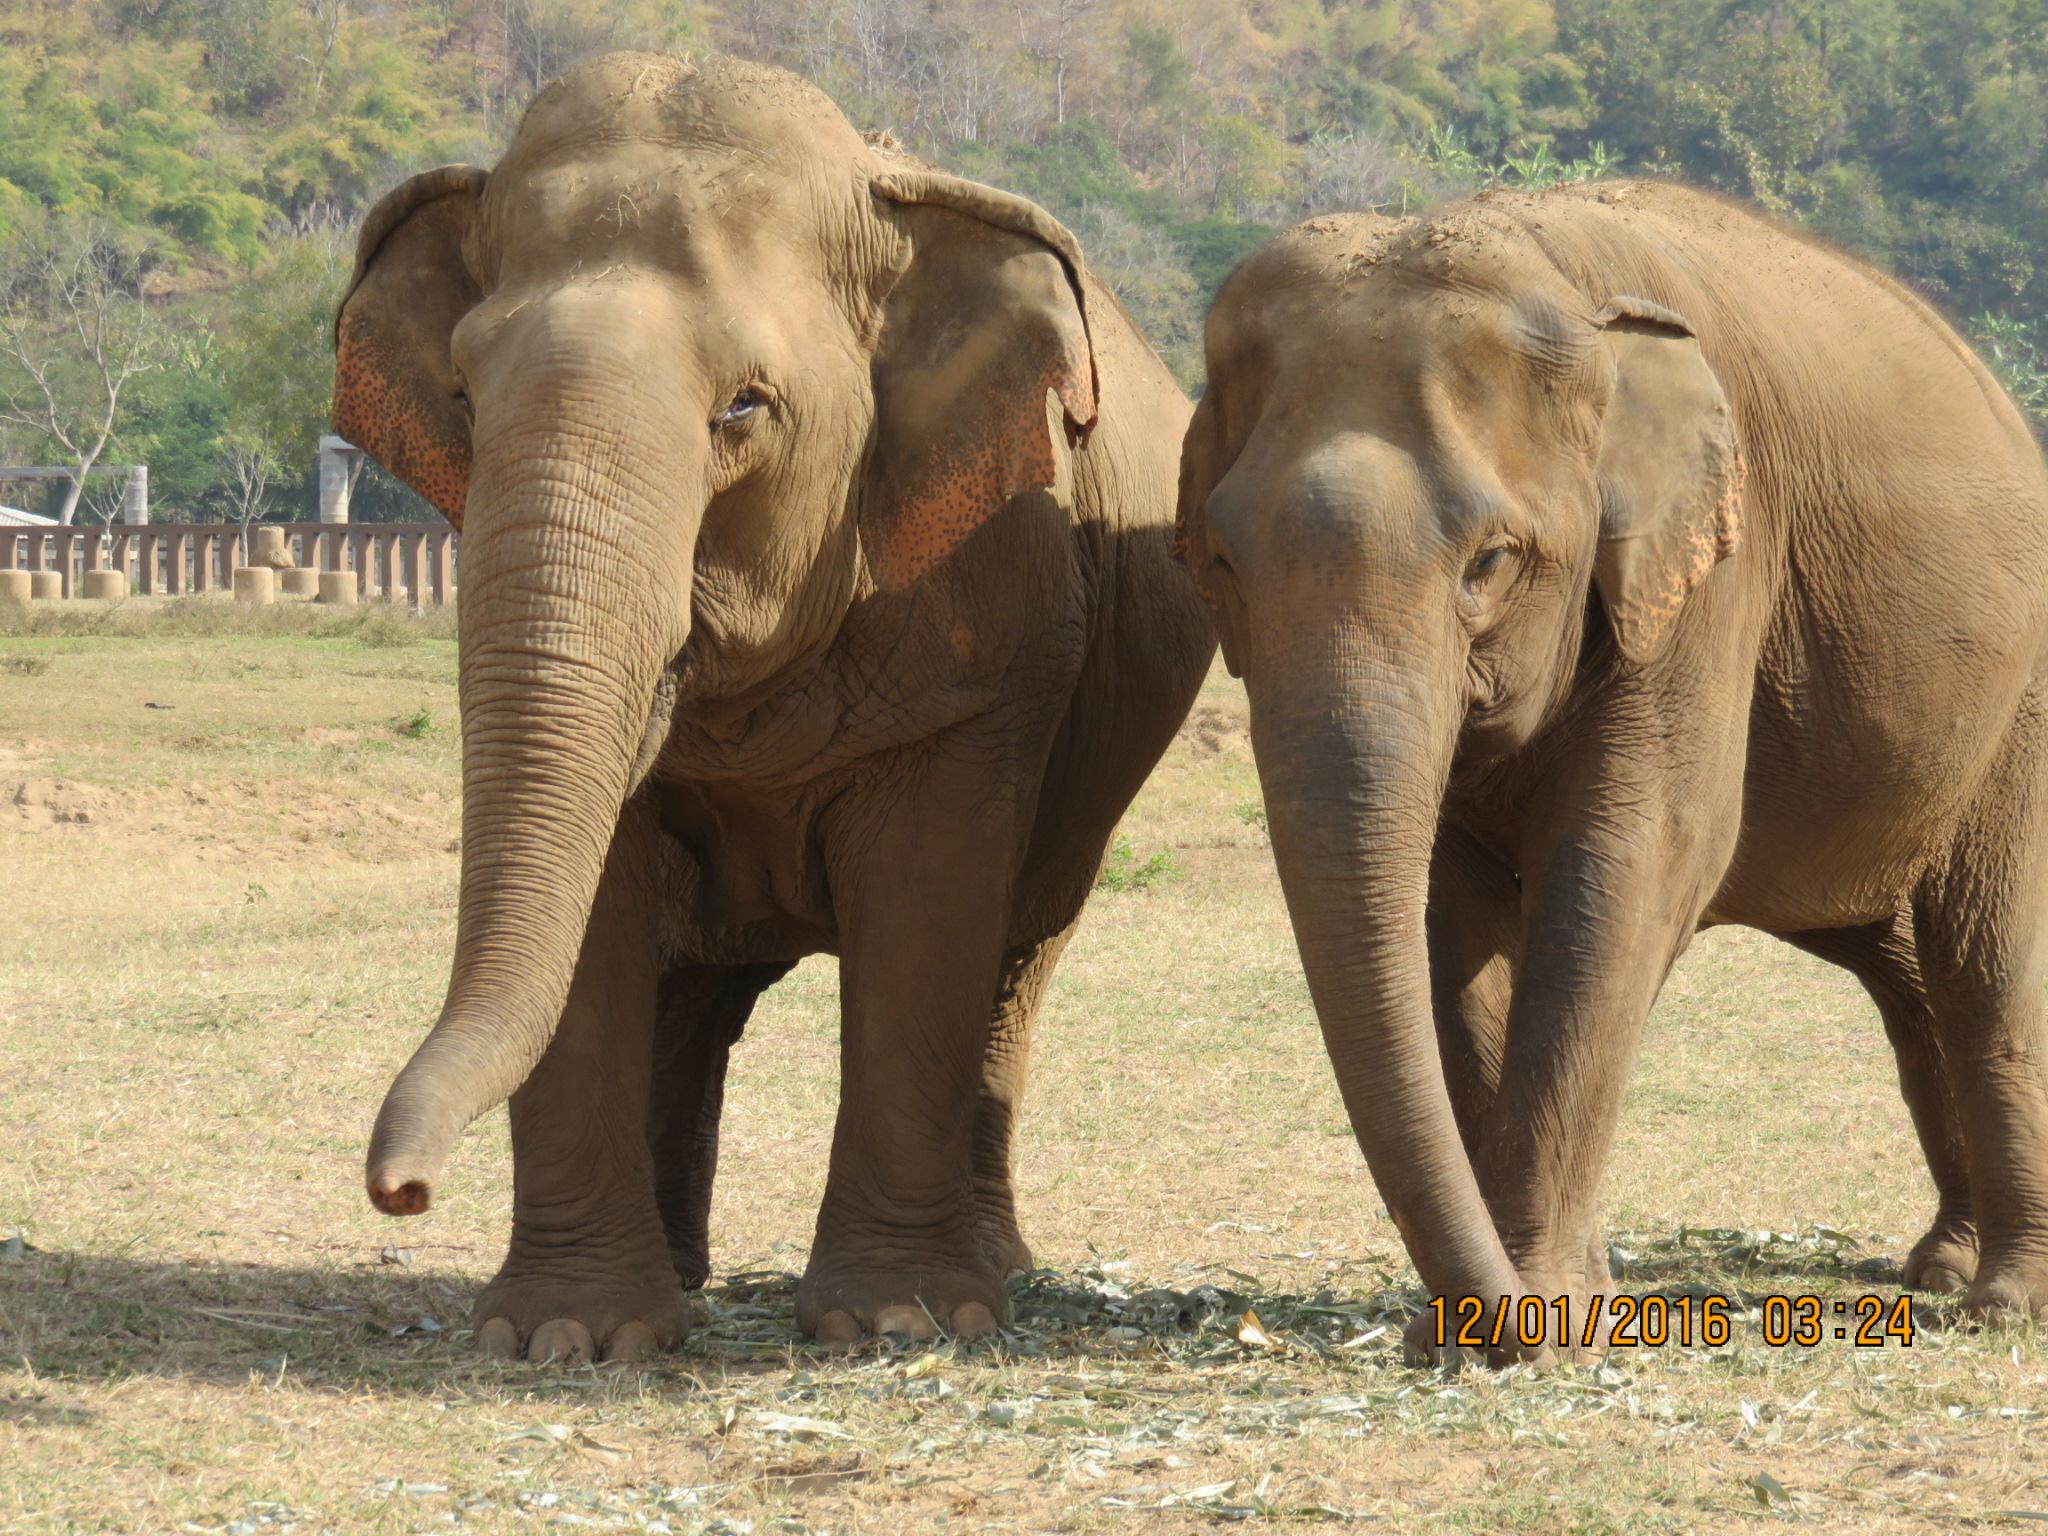 elephants-6.jpg